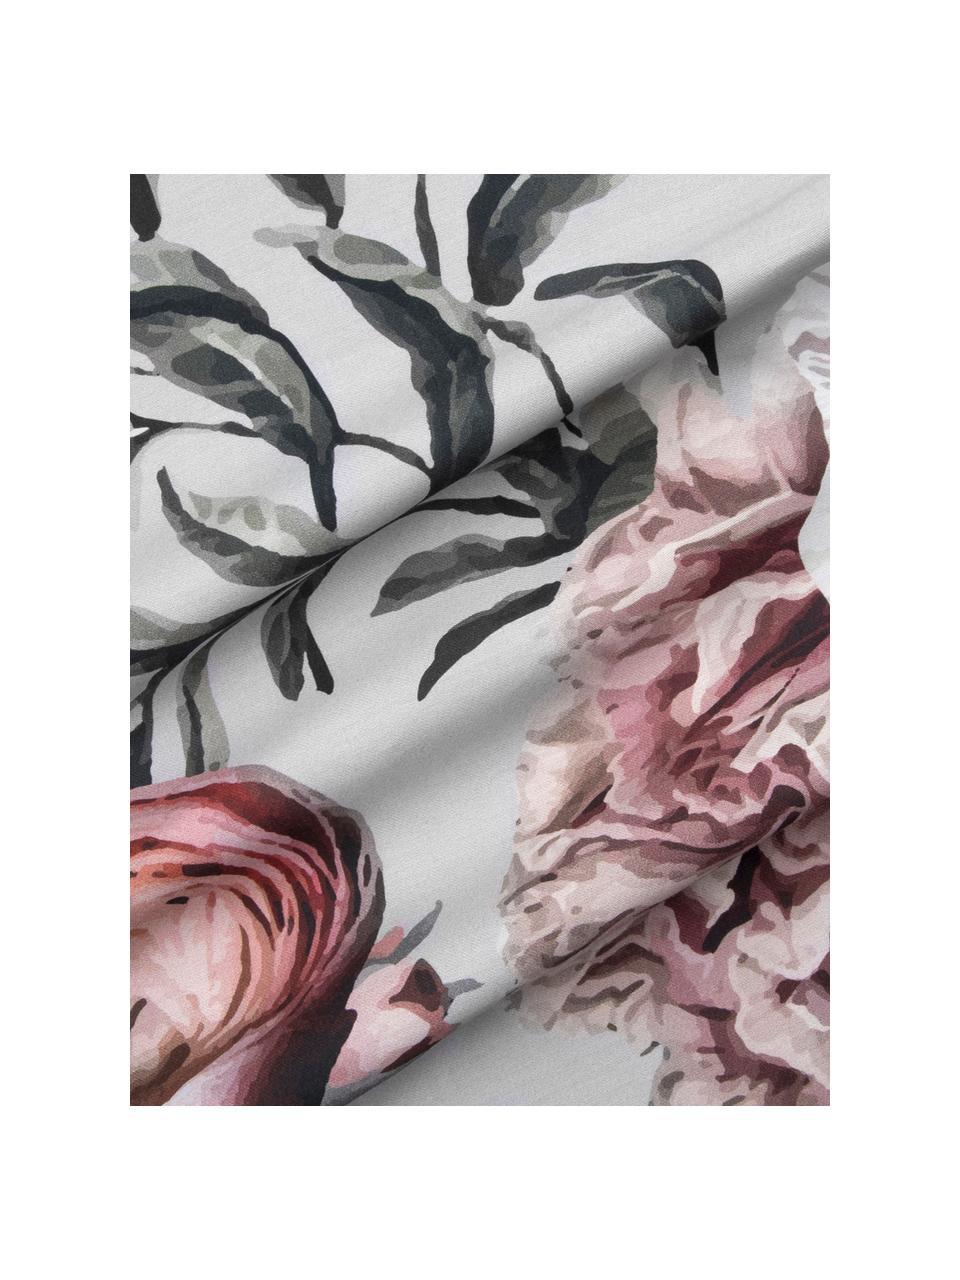 Baumwollsatin-Kopfkissenbezüge Blossom mit Blumen-Print, 2 Stück, Webart: Satin Fadendichte 210 TC,, Mehrfarbig, Grau, 40 x 80 cm